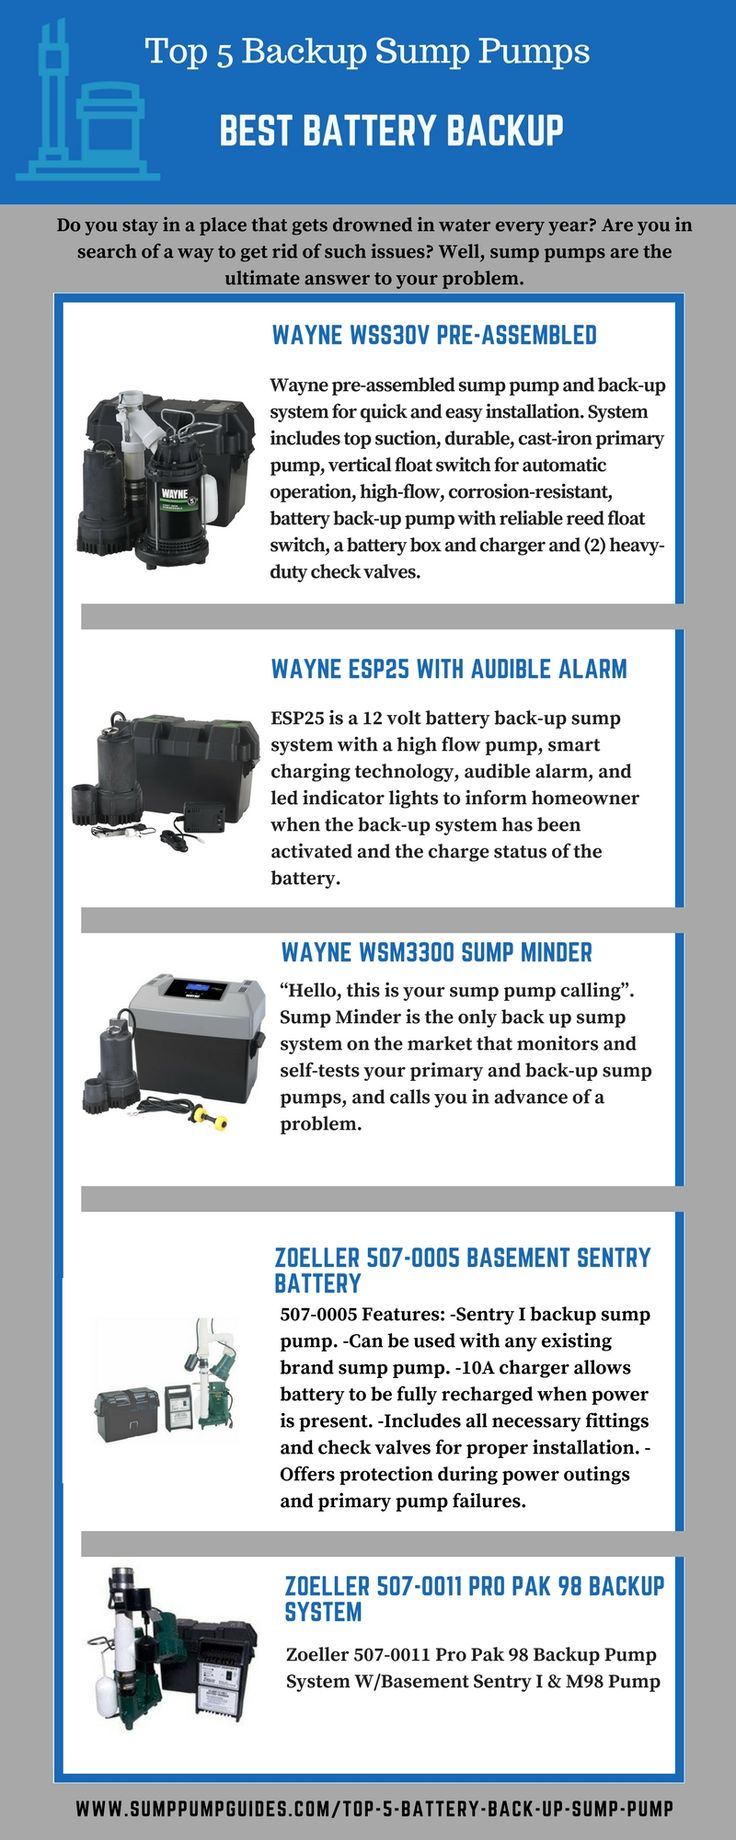 Best sump pump backup system - 17 Best Ideas About Sump Pump On Pinterest Front Flower Beds Wiring Diagram